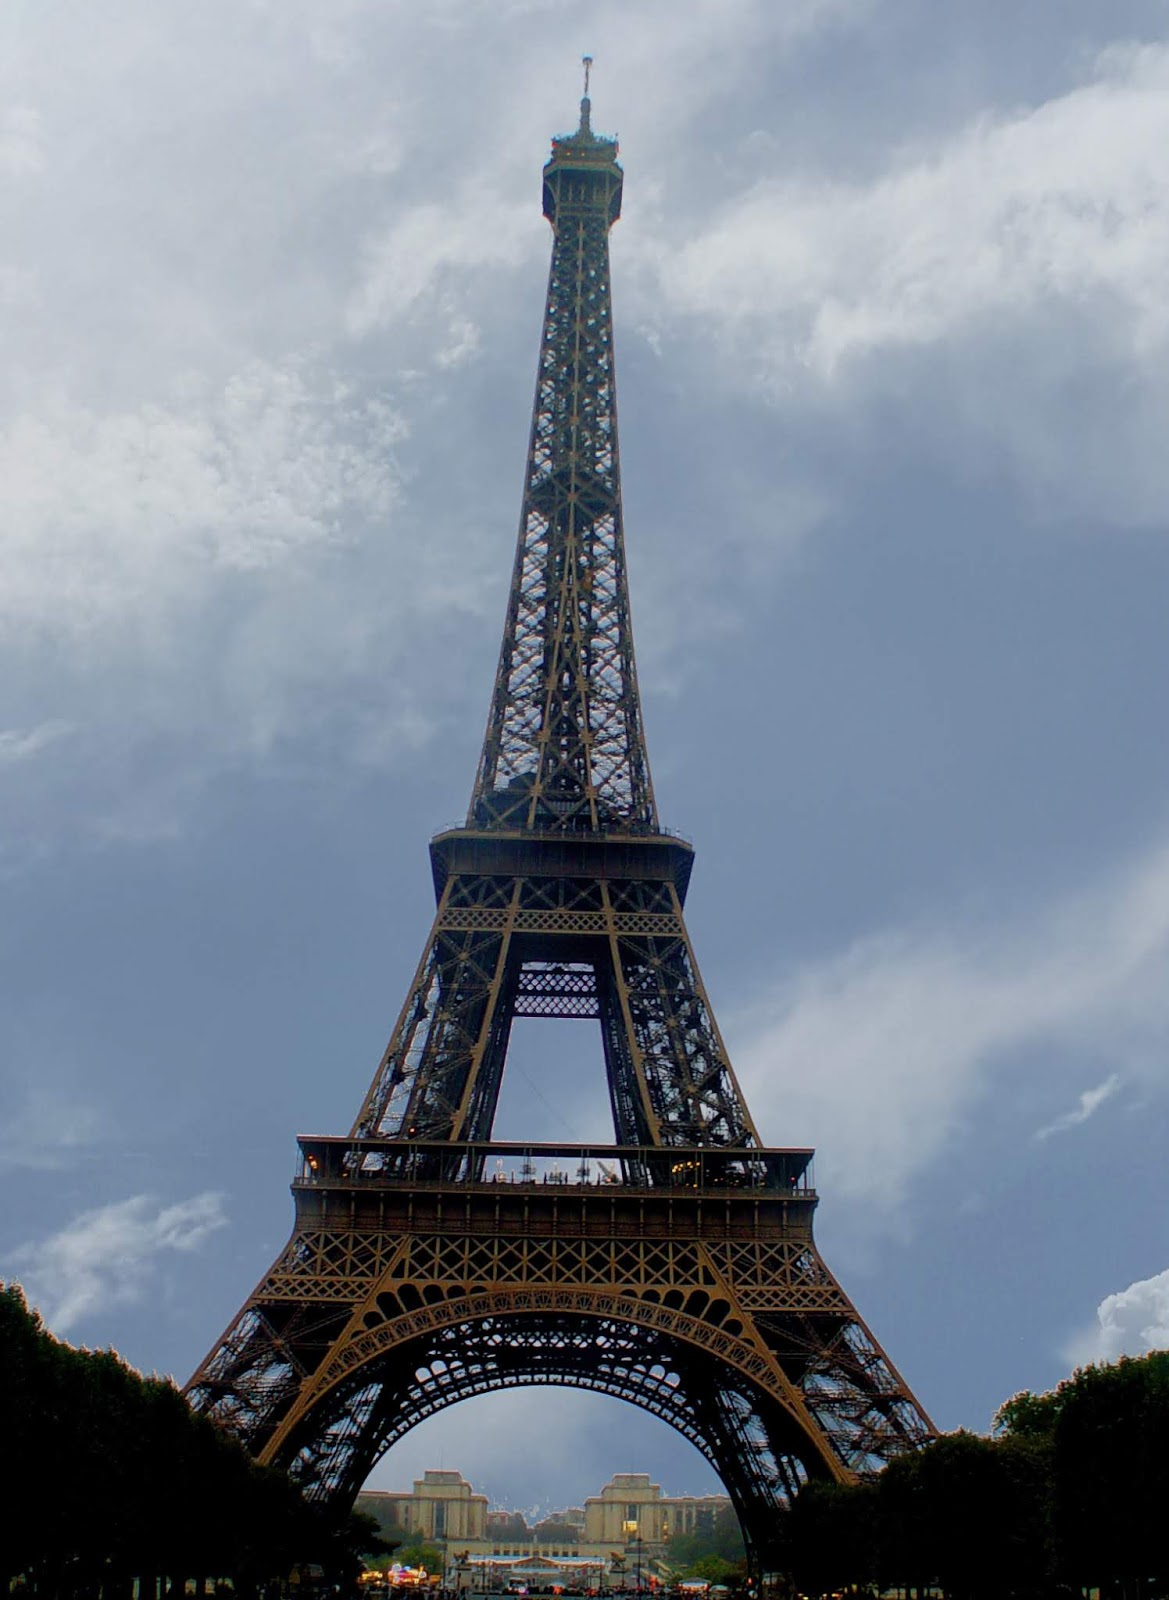 Paris - Eiffel Tower 4